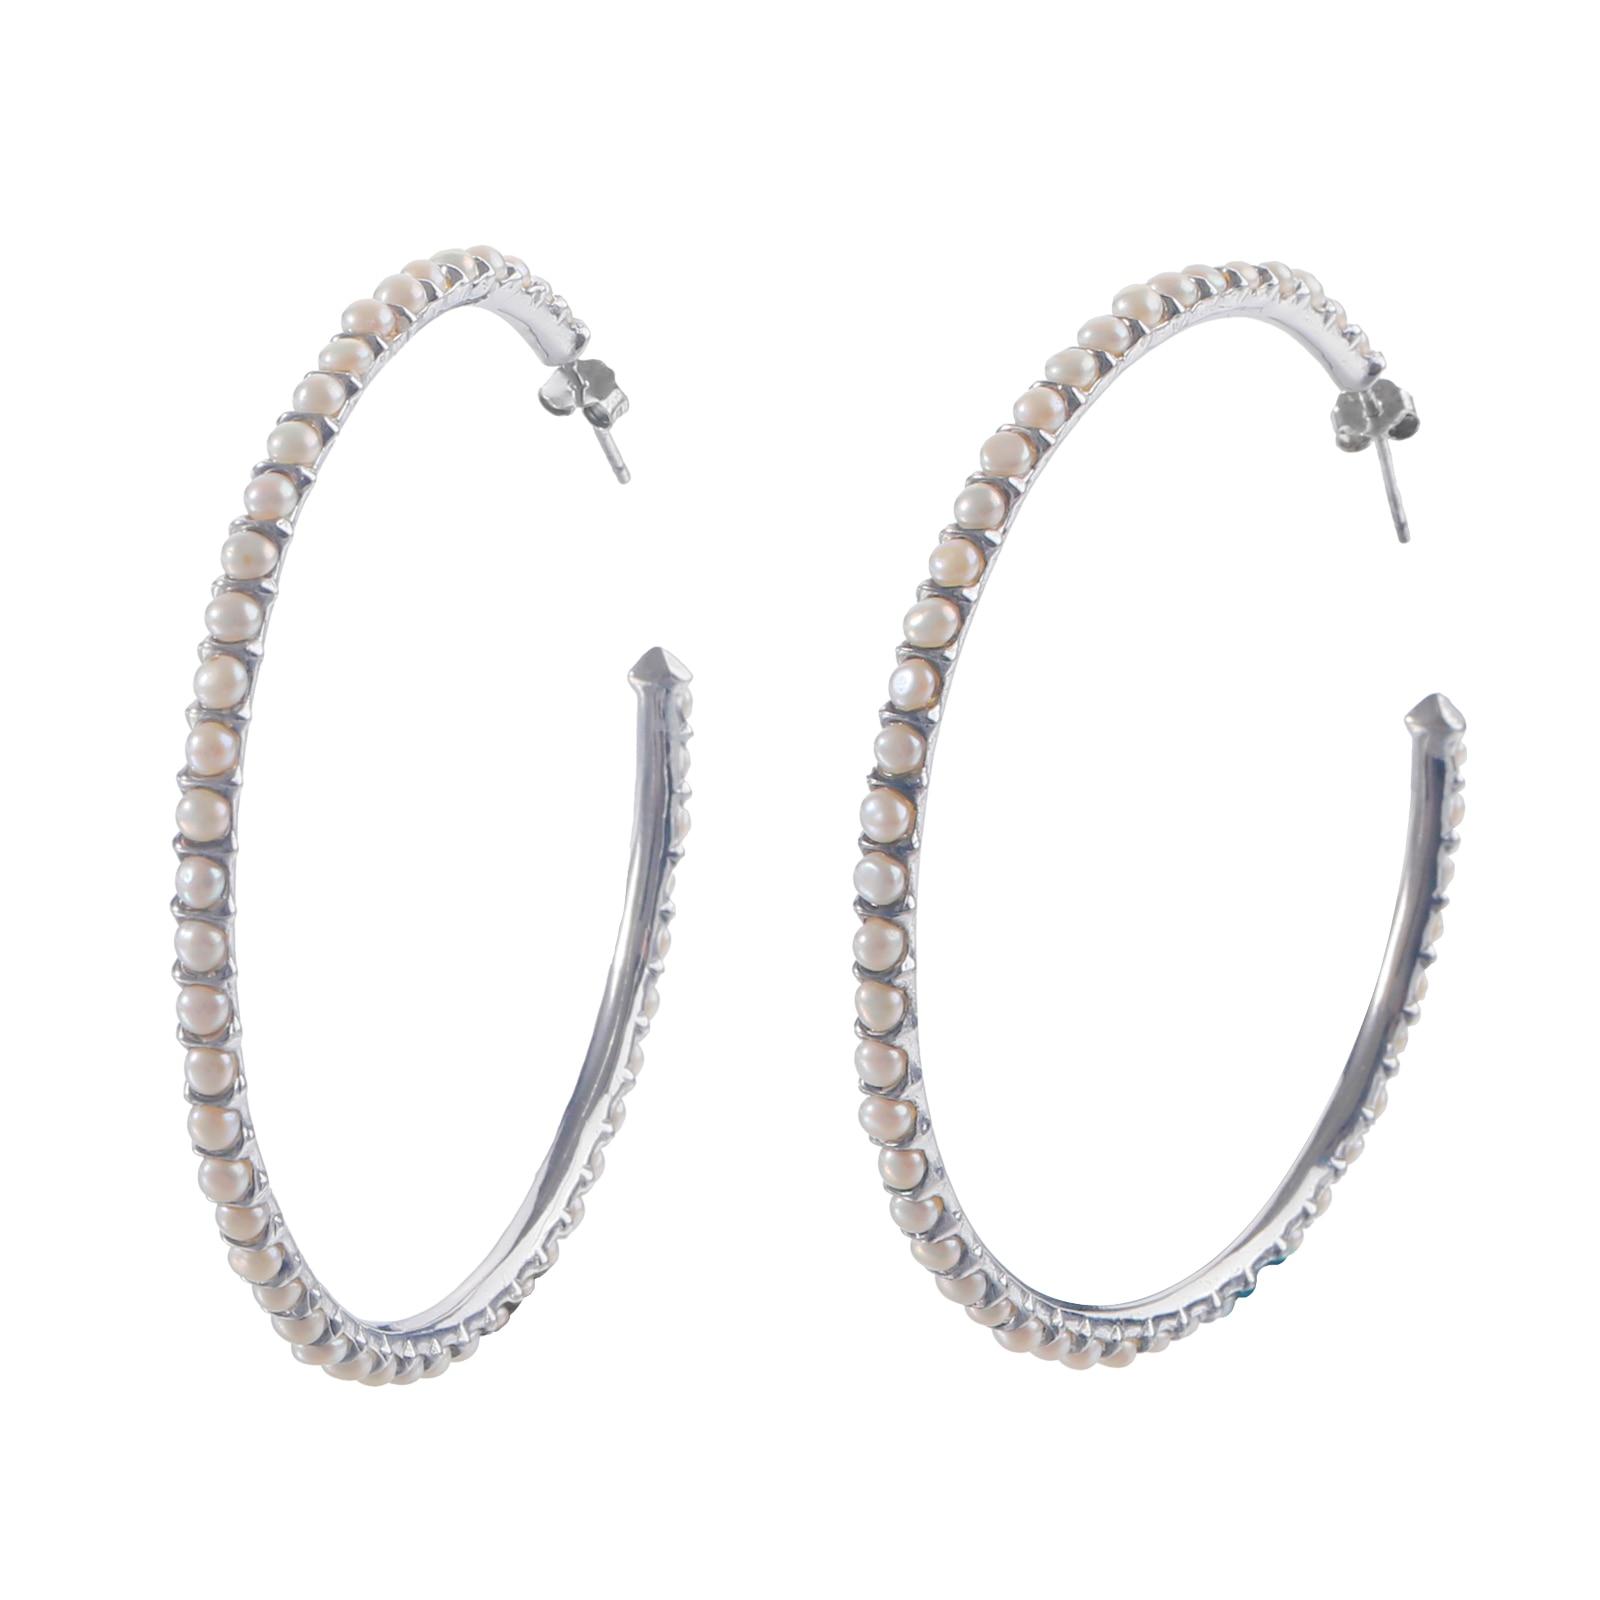 New Natural Freshwater Pearl Hoop Earrings For Women C Shape Handmade Earrings Fashion Party Charm F